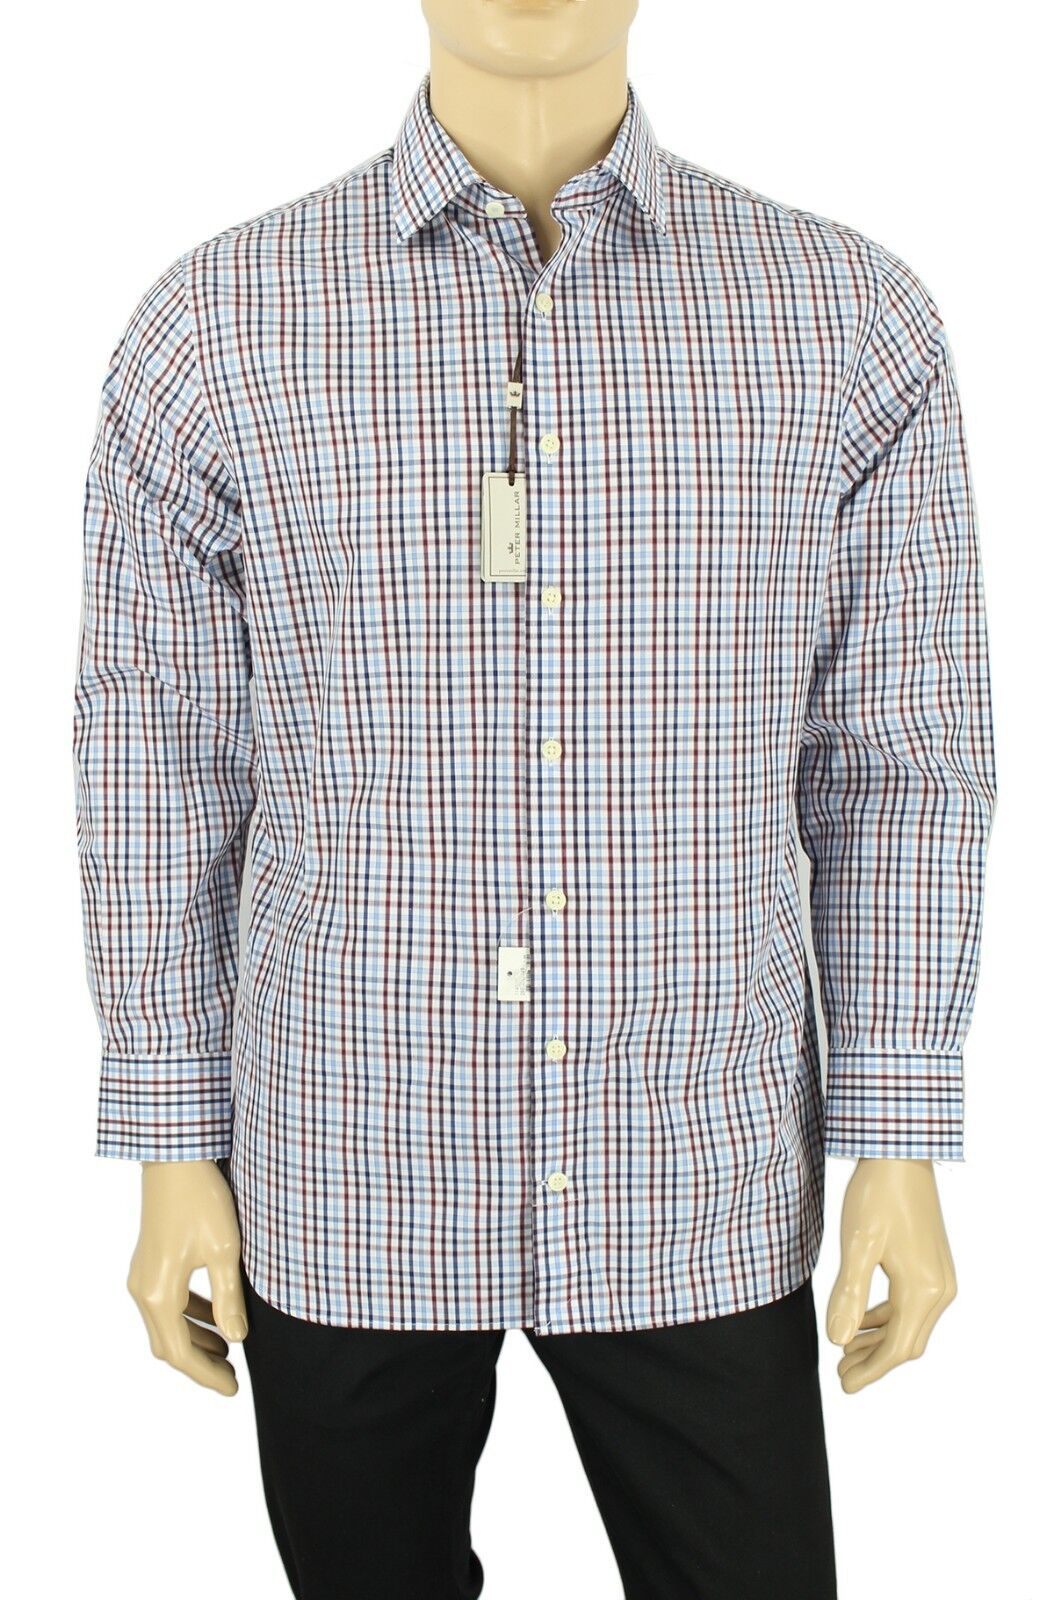 NEW  Herren PETER MILLAR REGULAR NANOLUXE EASY CARE PLAID DRESS SHIRT 16 32/33